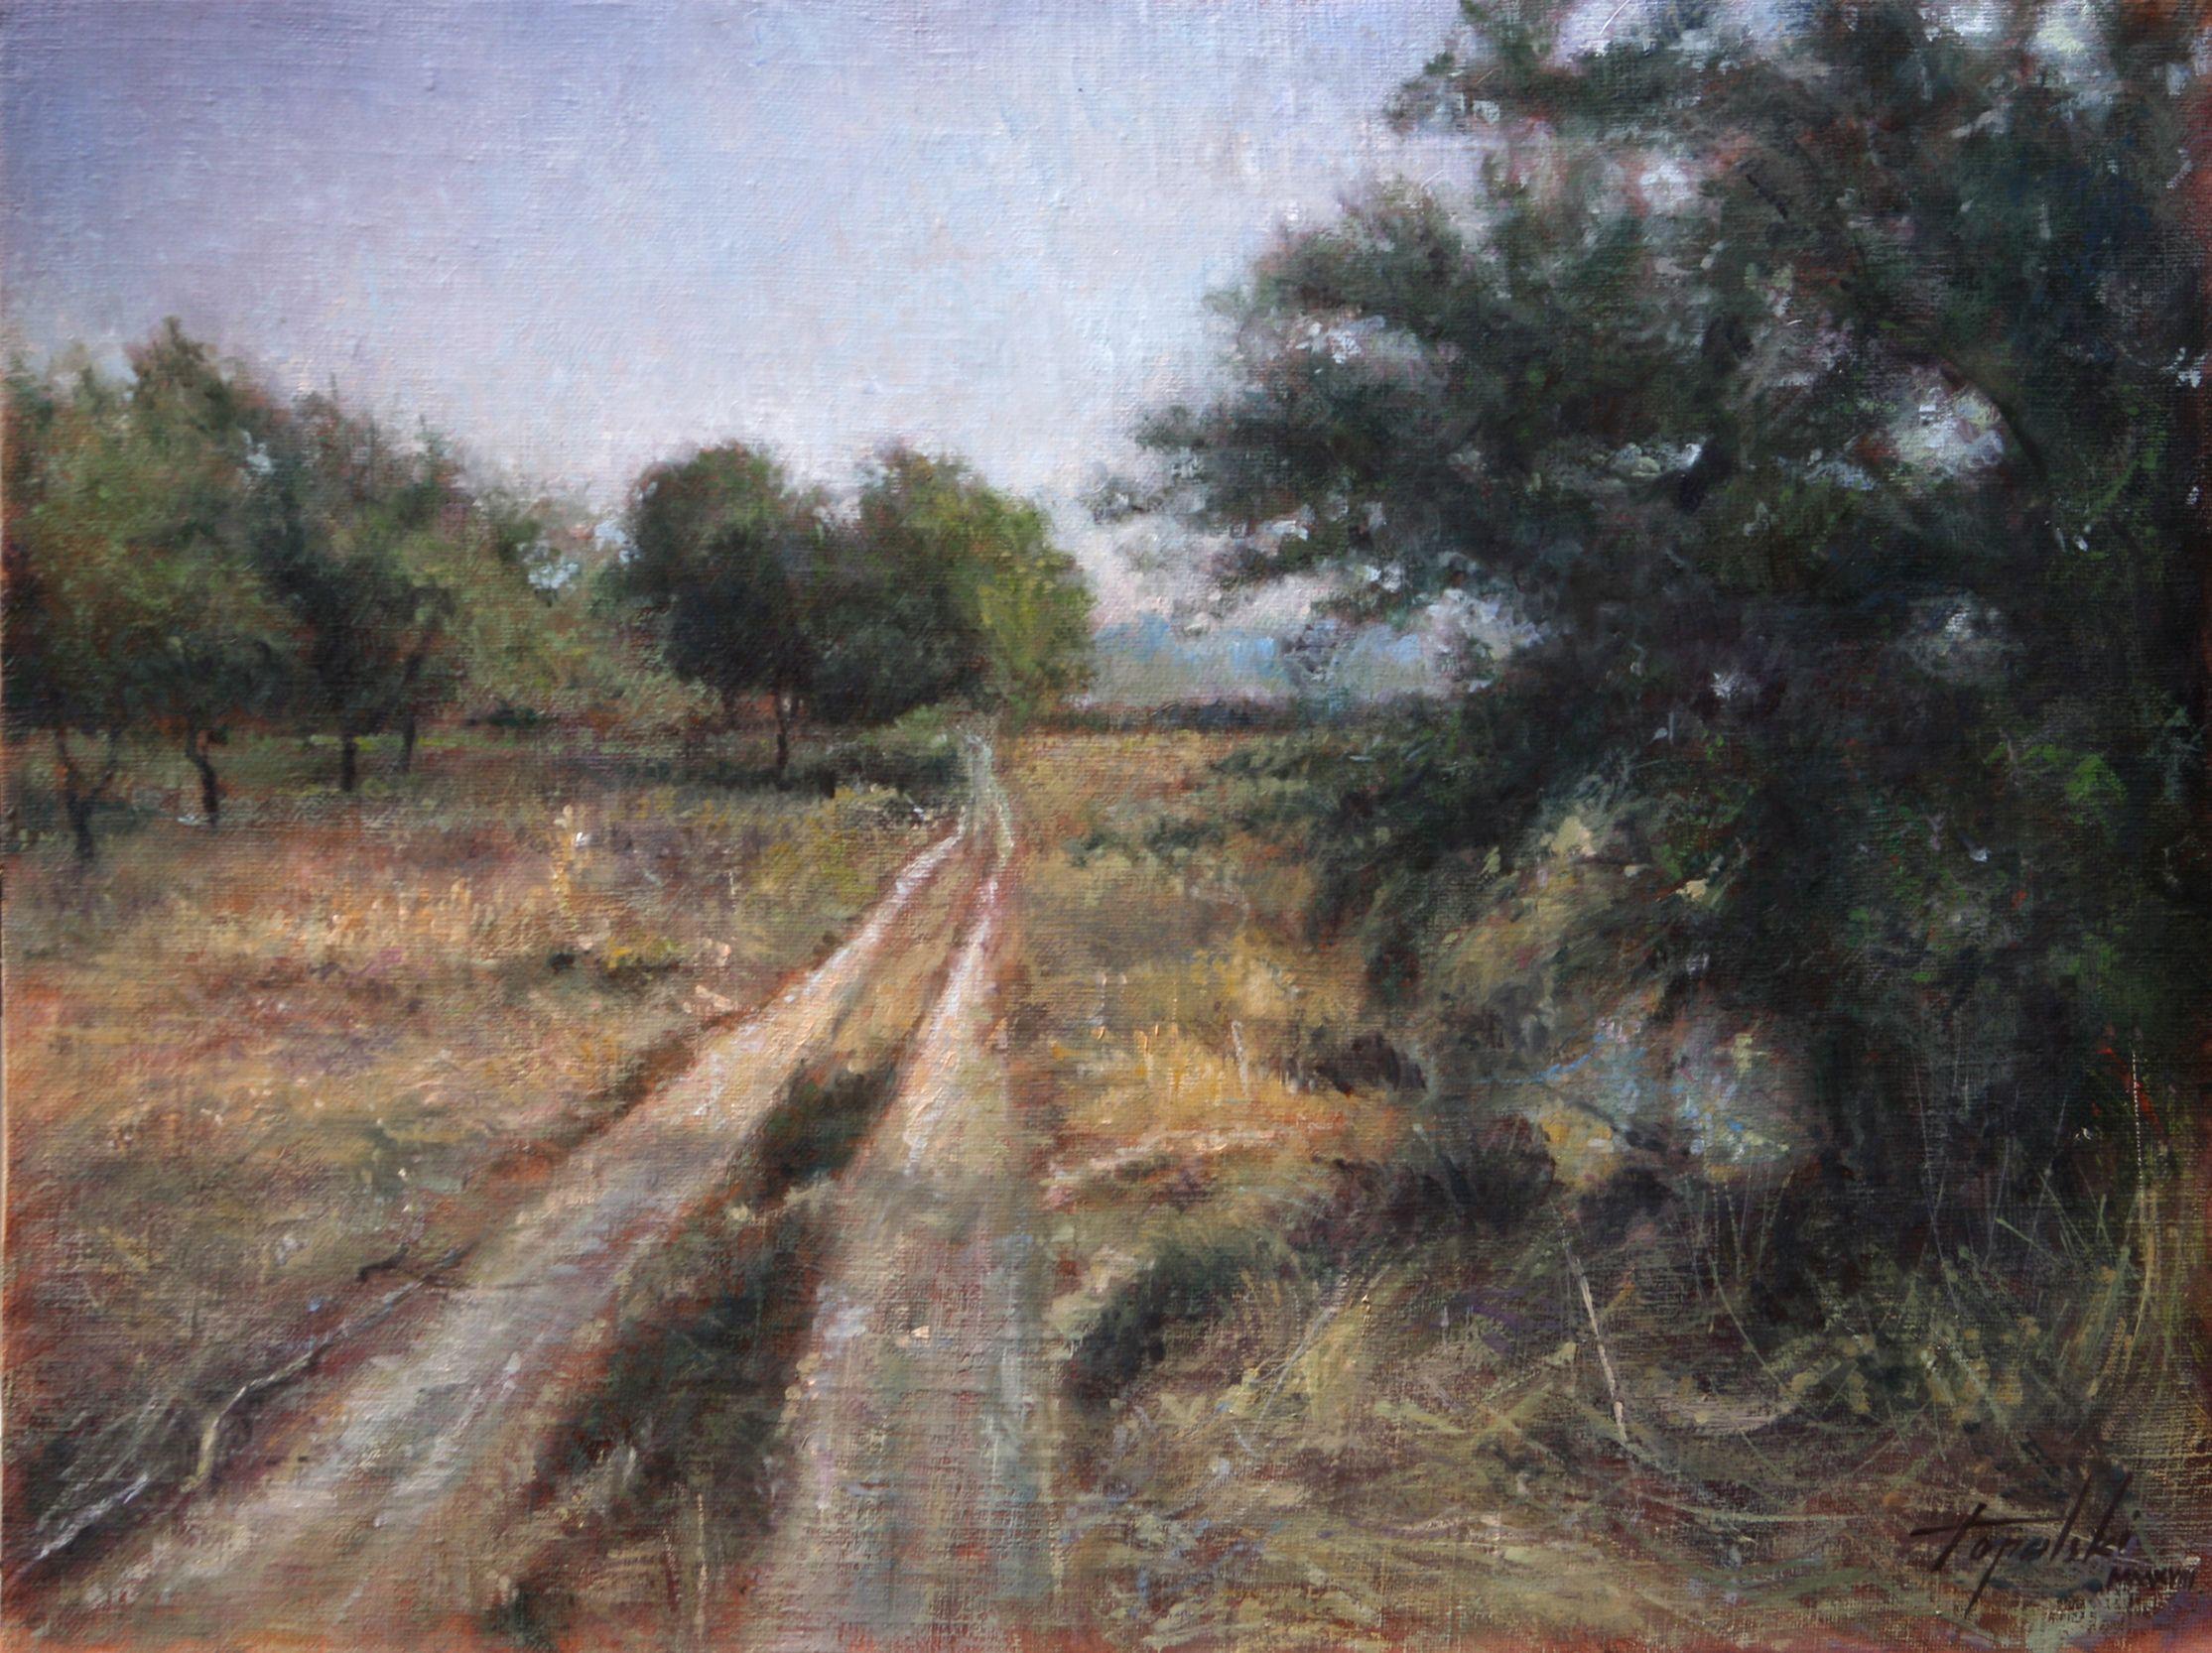 Fine Art Country Road Original Oil Painting On Canvas By Artist Darko Topalski Fine Art Painting Oil Oil Painting Landscape Oil Painting